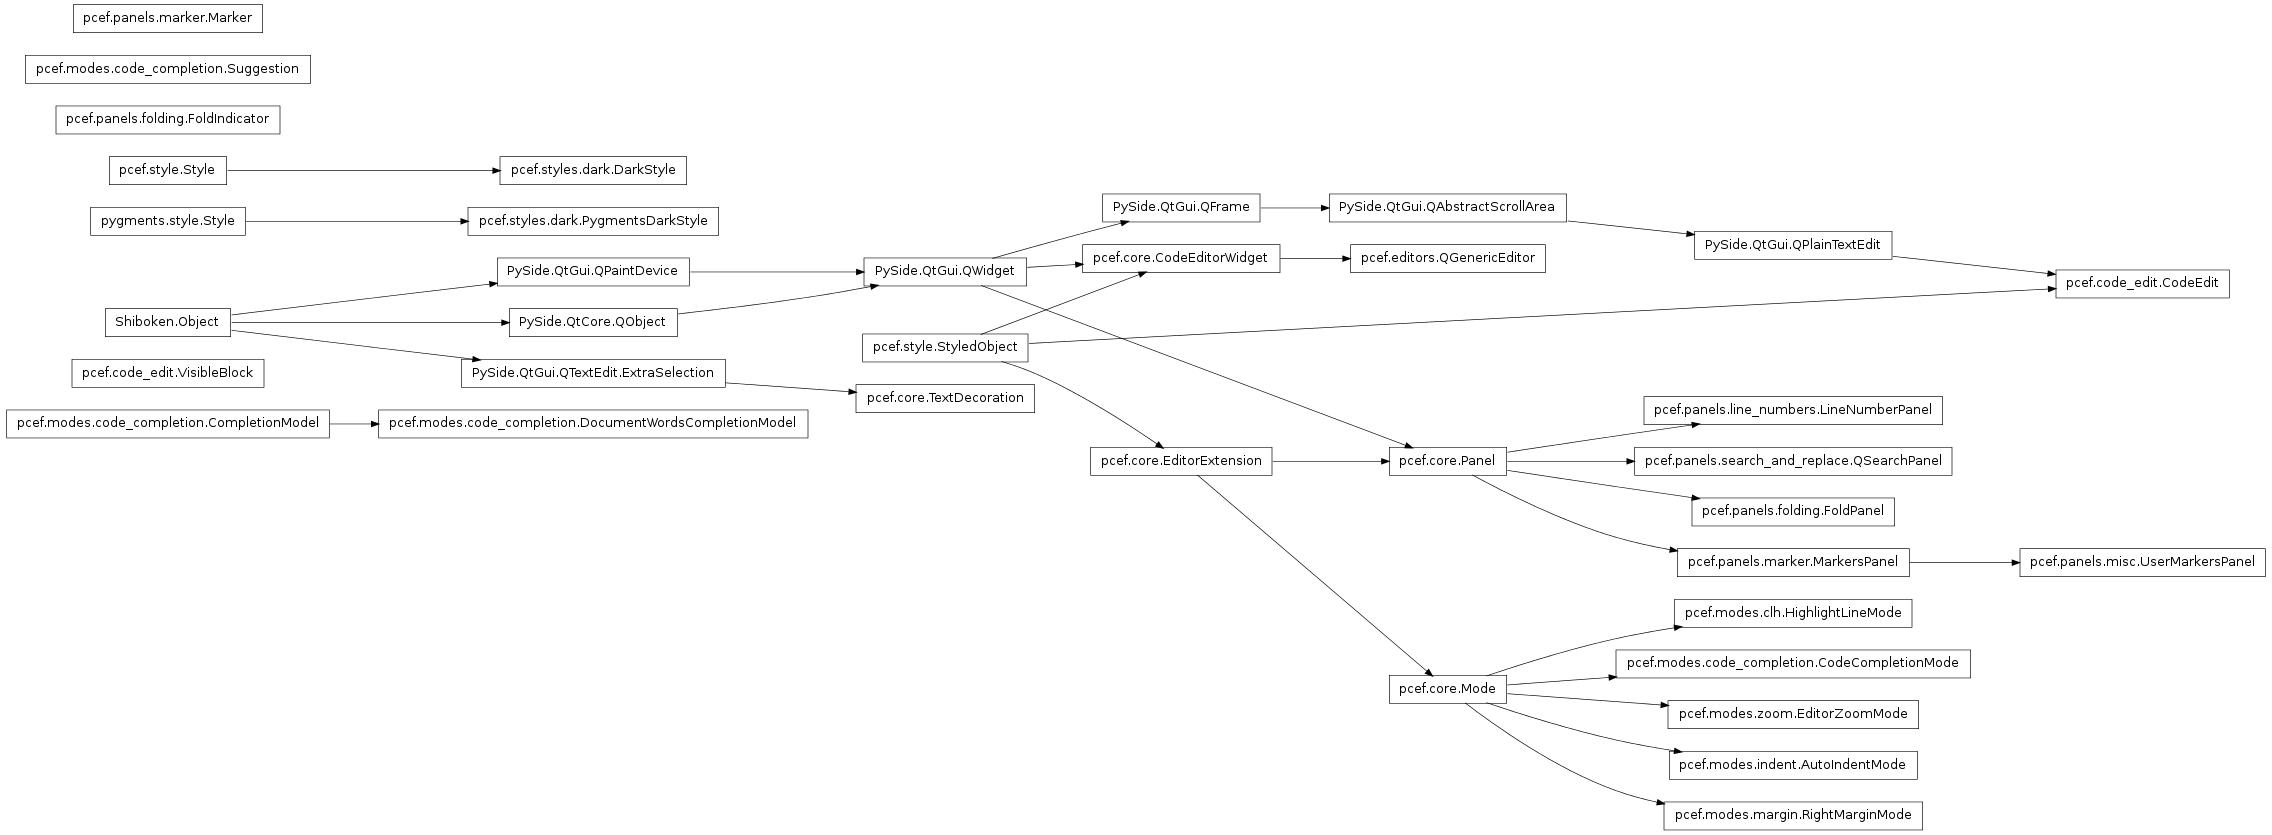 Pcef class diagram pcef 011 documentation inheritance diagram of pcefdesh pcefdesdecompletion pcef ccuart Images